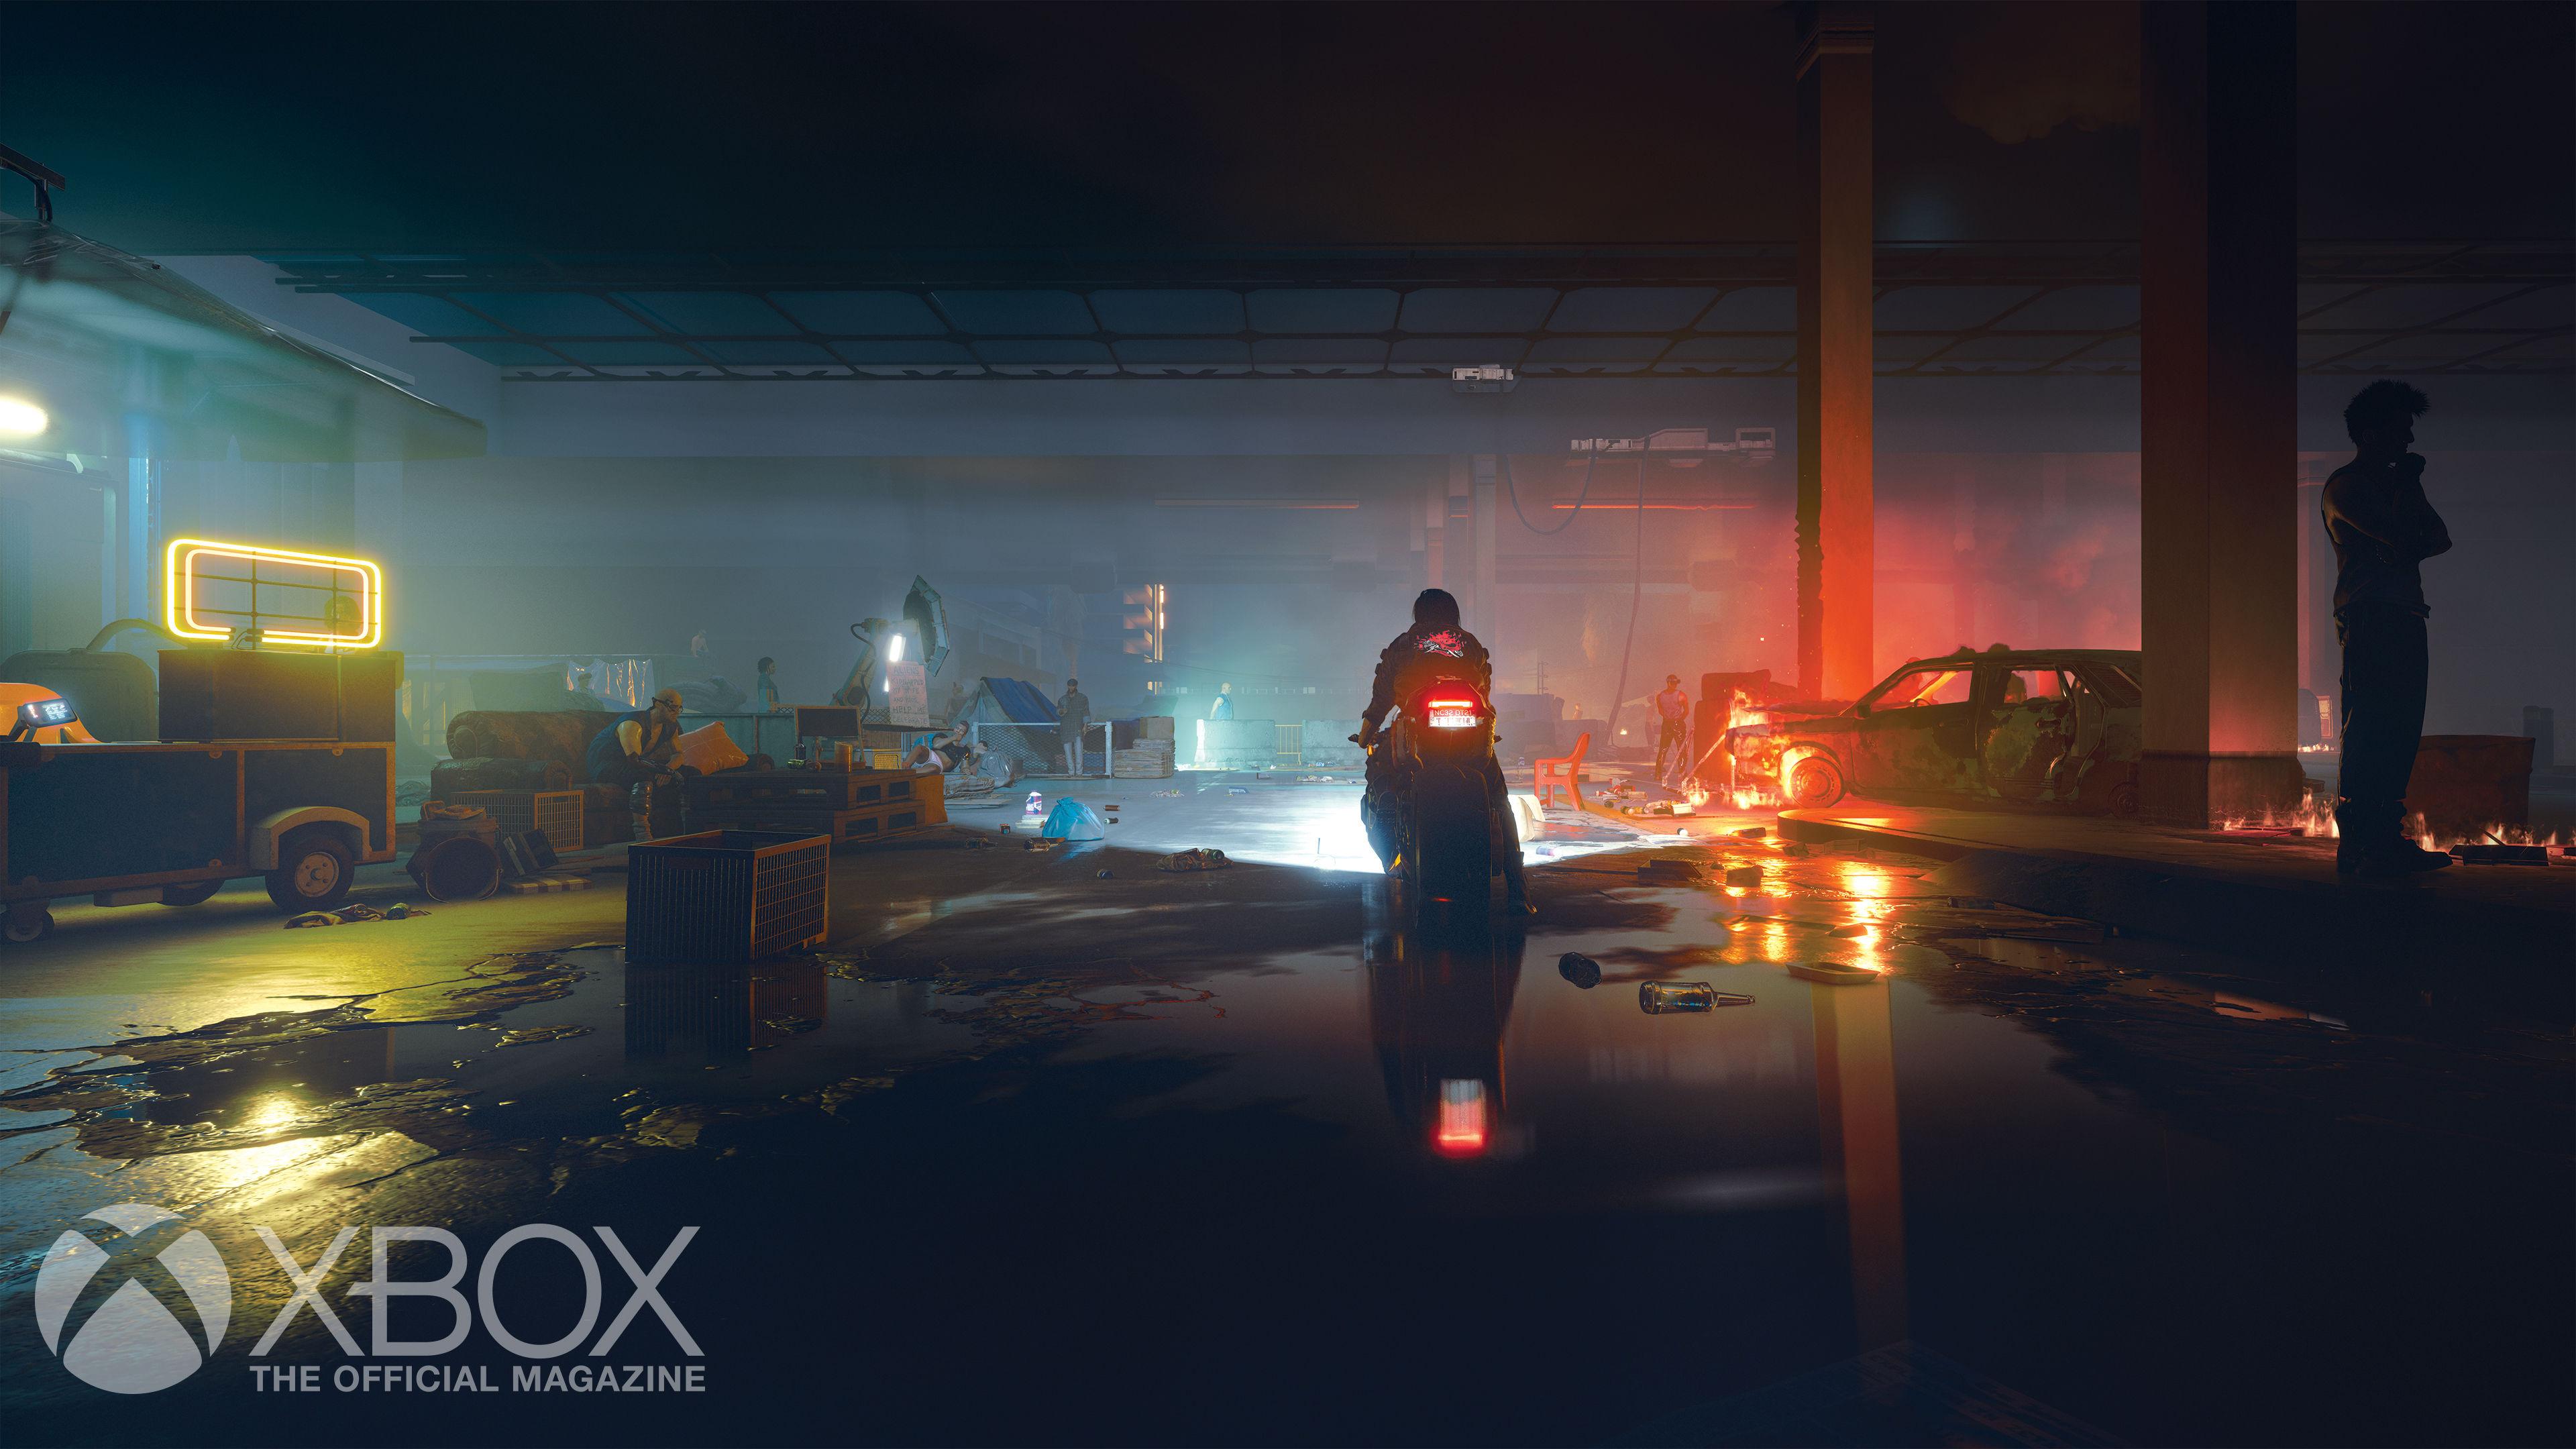 Геймплей [4K] - Cyberpunk 2077